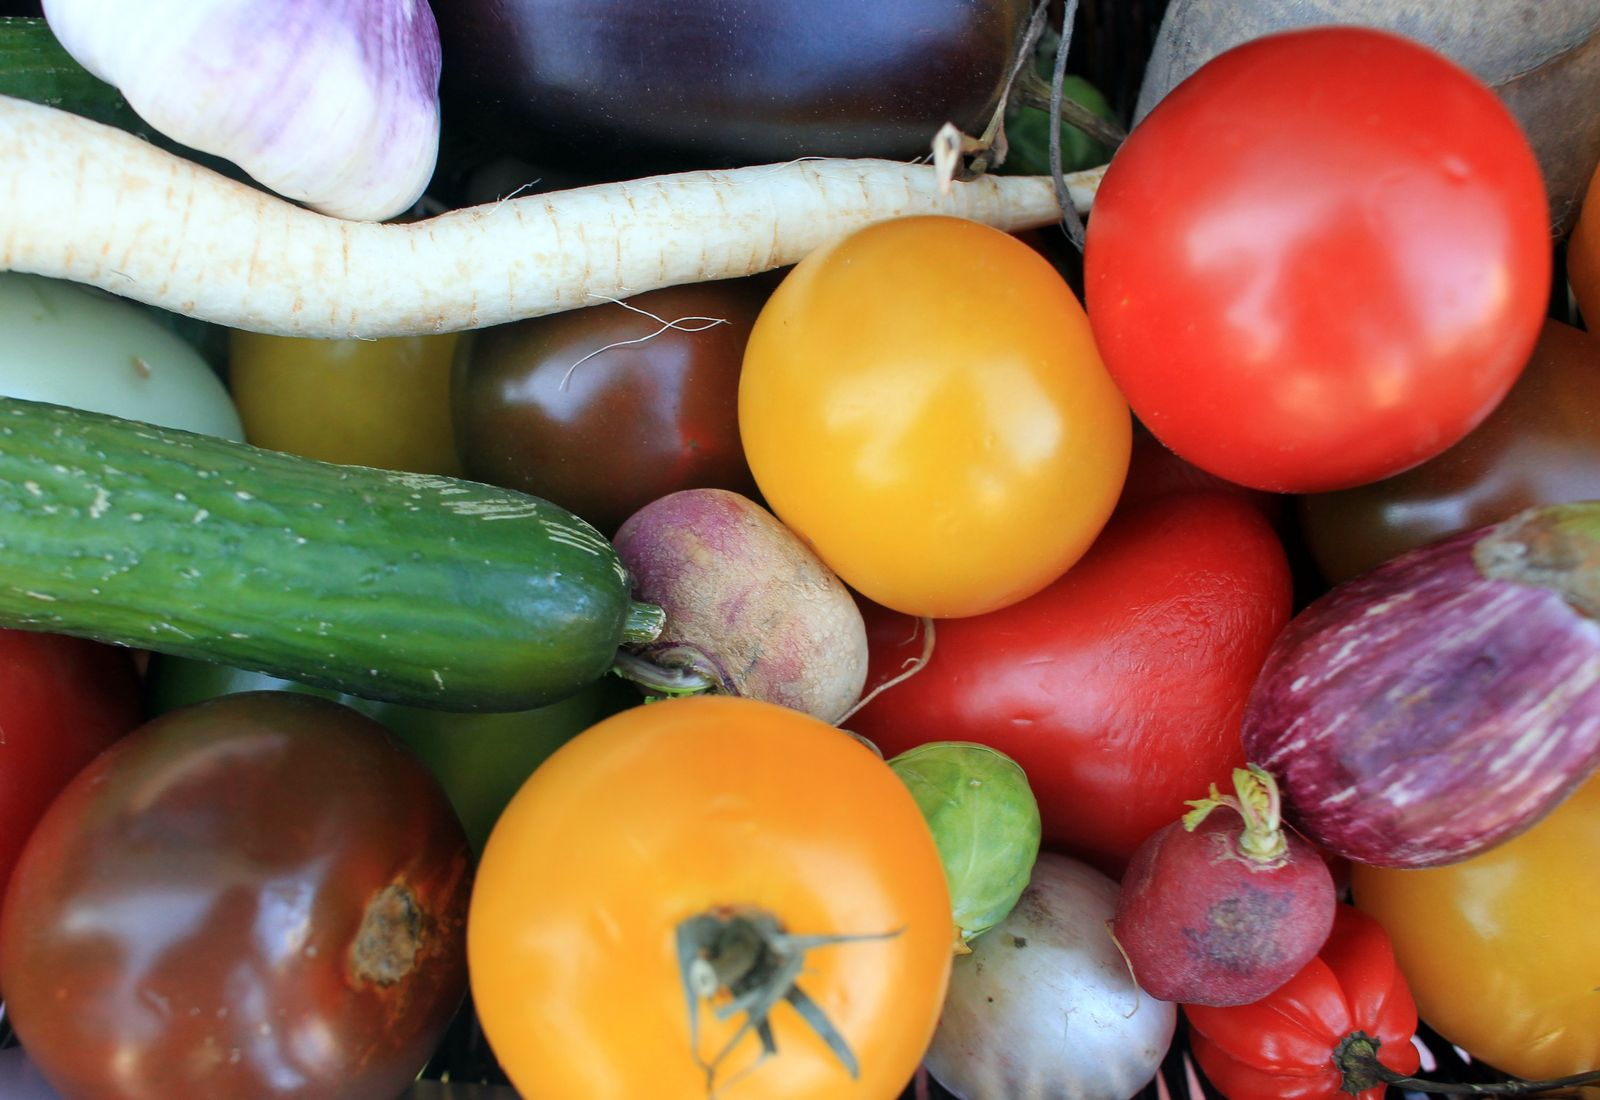 Staßfurt / Gemüse / Korb